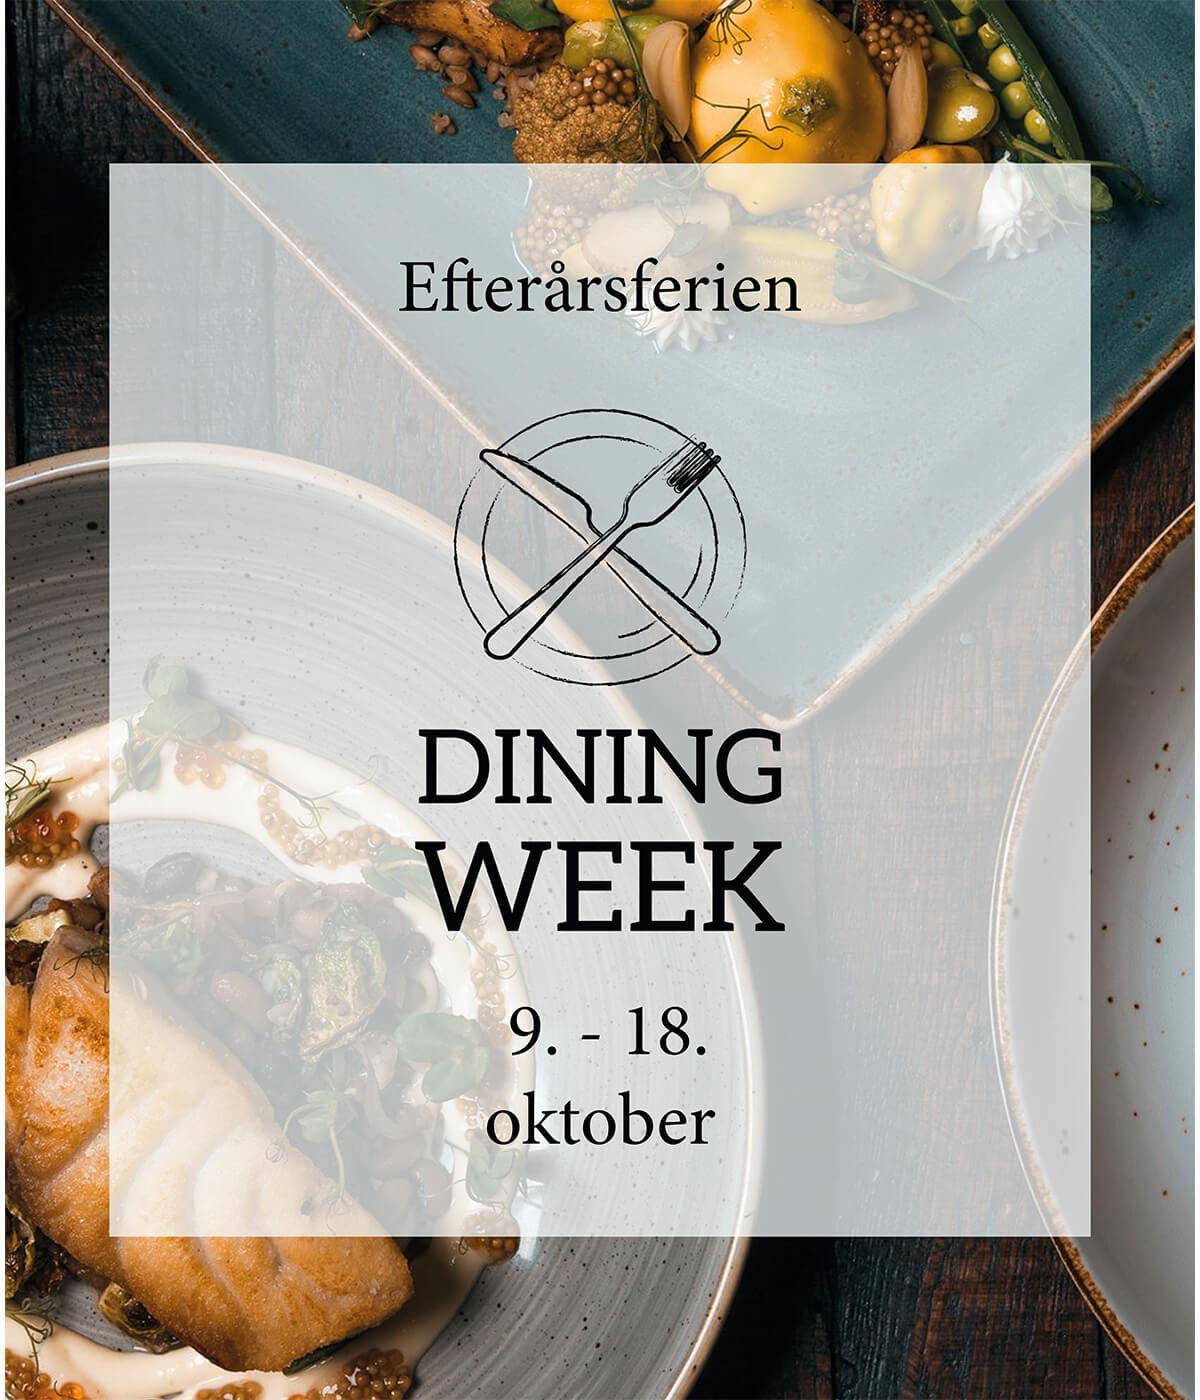 dinning week uge 42